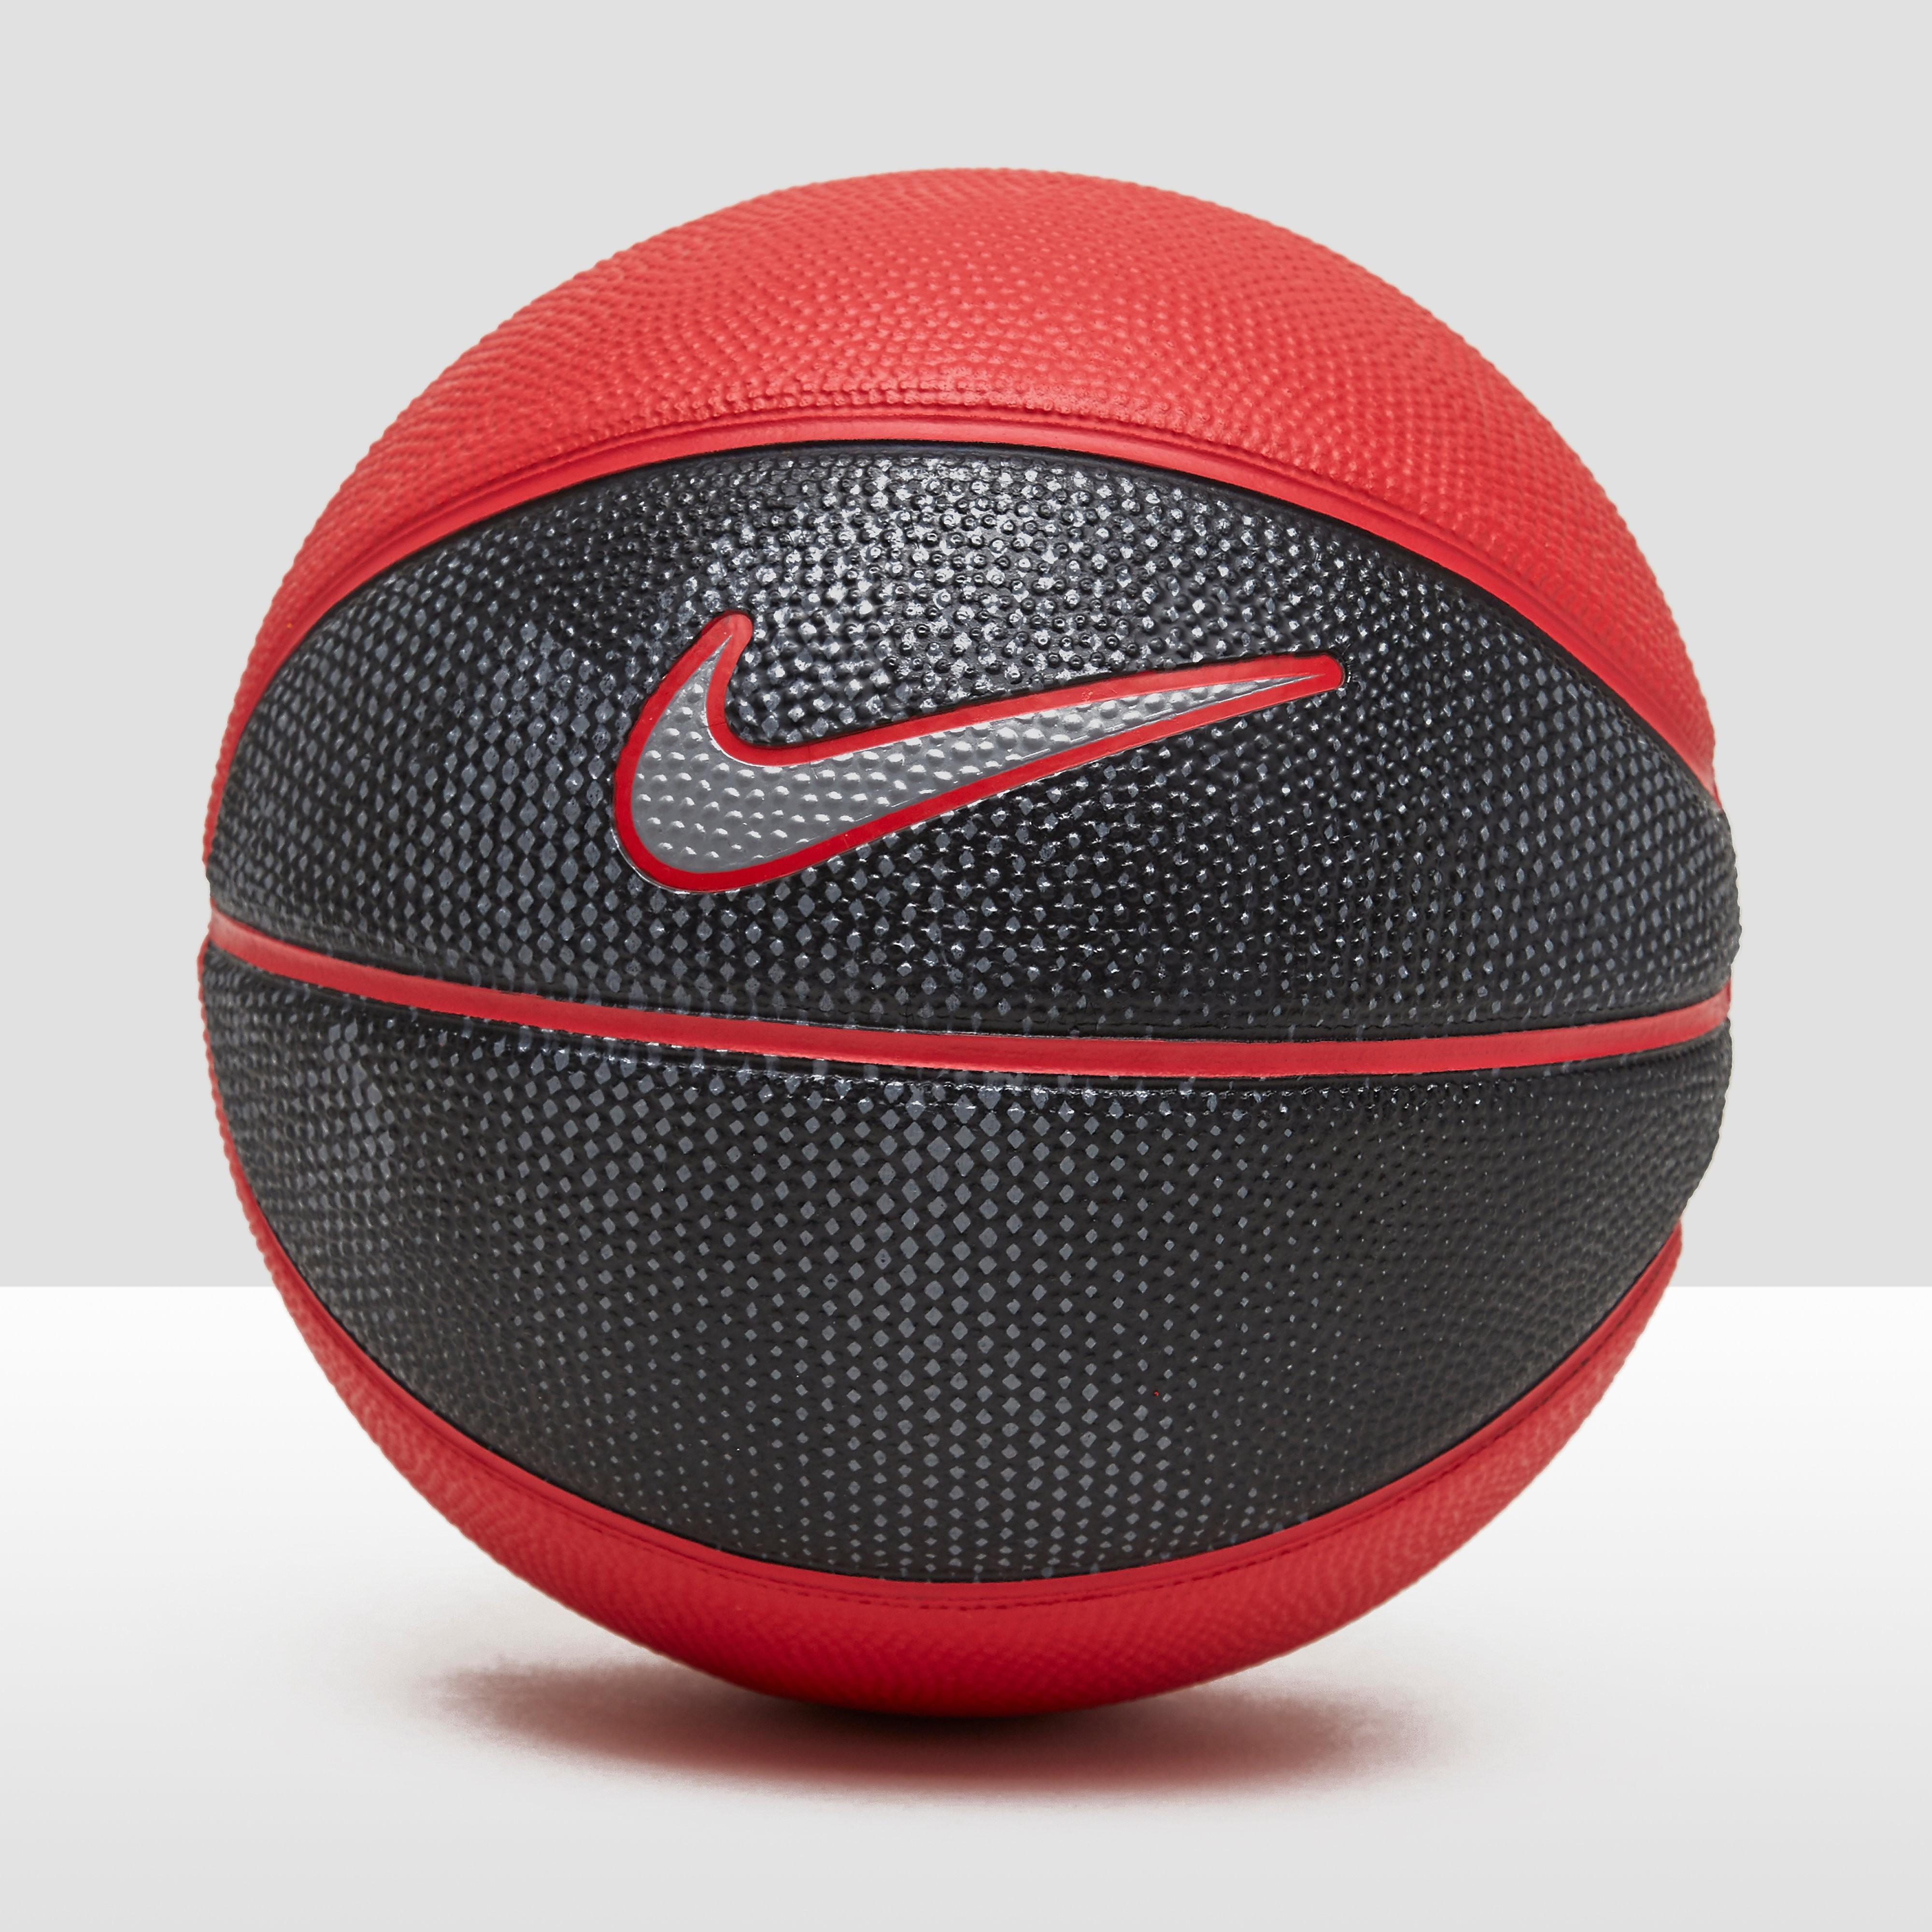 Skills Rubber Basketbal Zwart/Rood